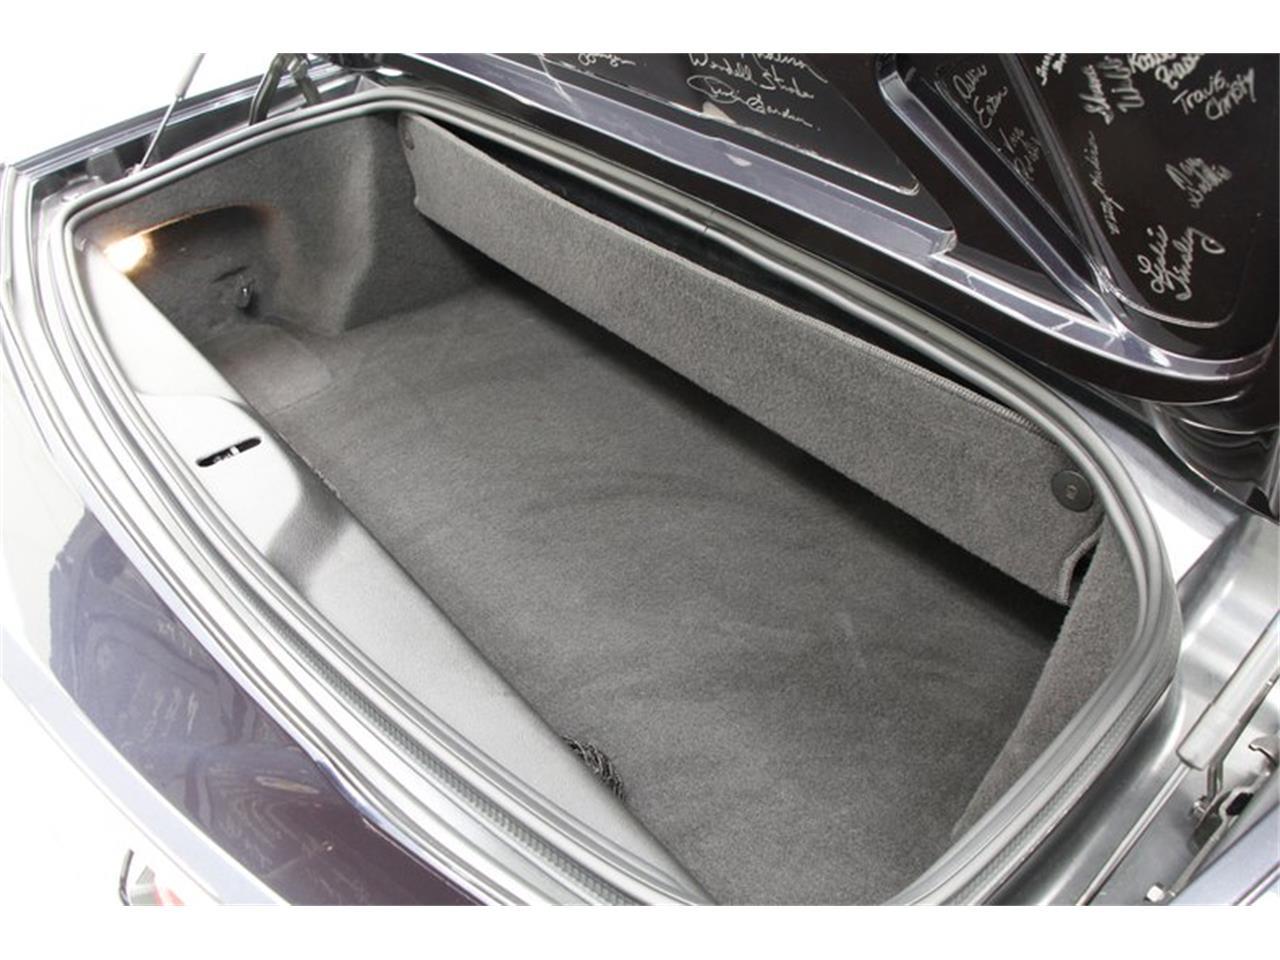 2014 Chevrolet Corvette (CC-1314197) for sale in Morgantown, Pennsylvania